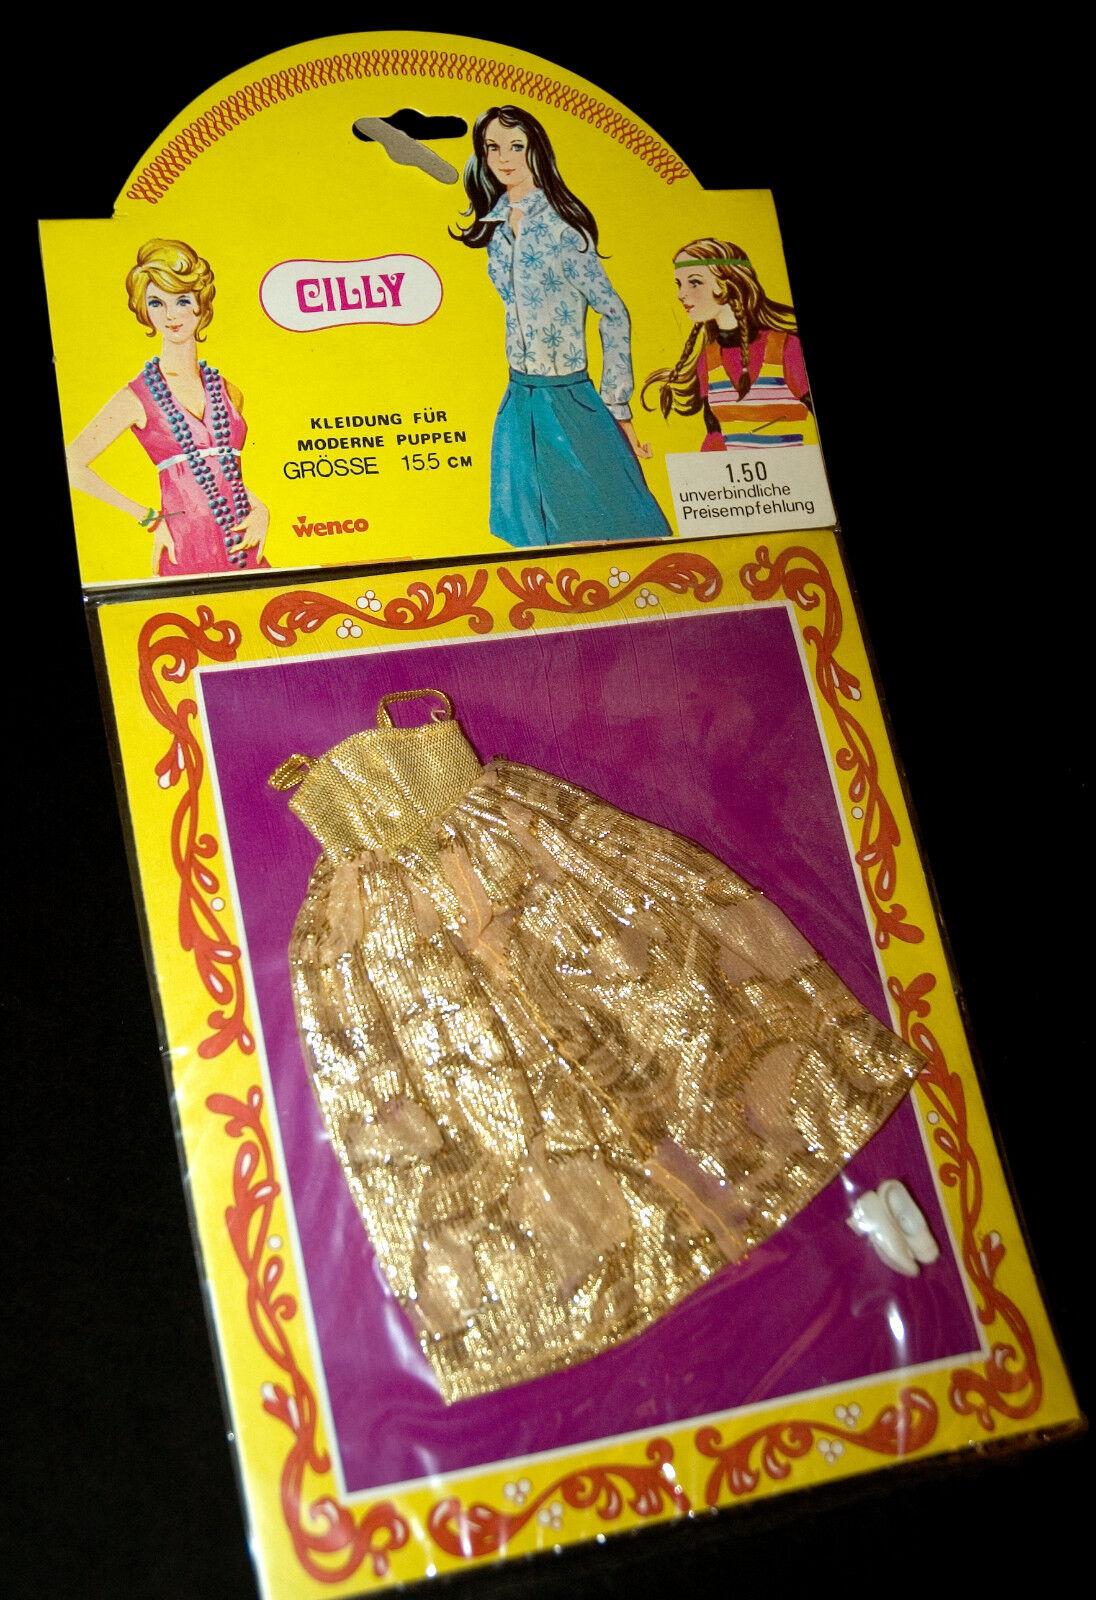 Cilly vintage 70s Topper Dollhouse Doll rare oro atuendo 15cm vestidos de muñecas